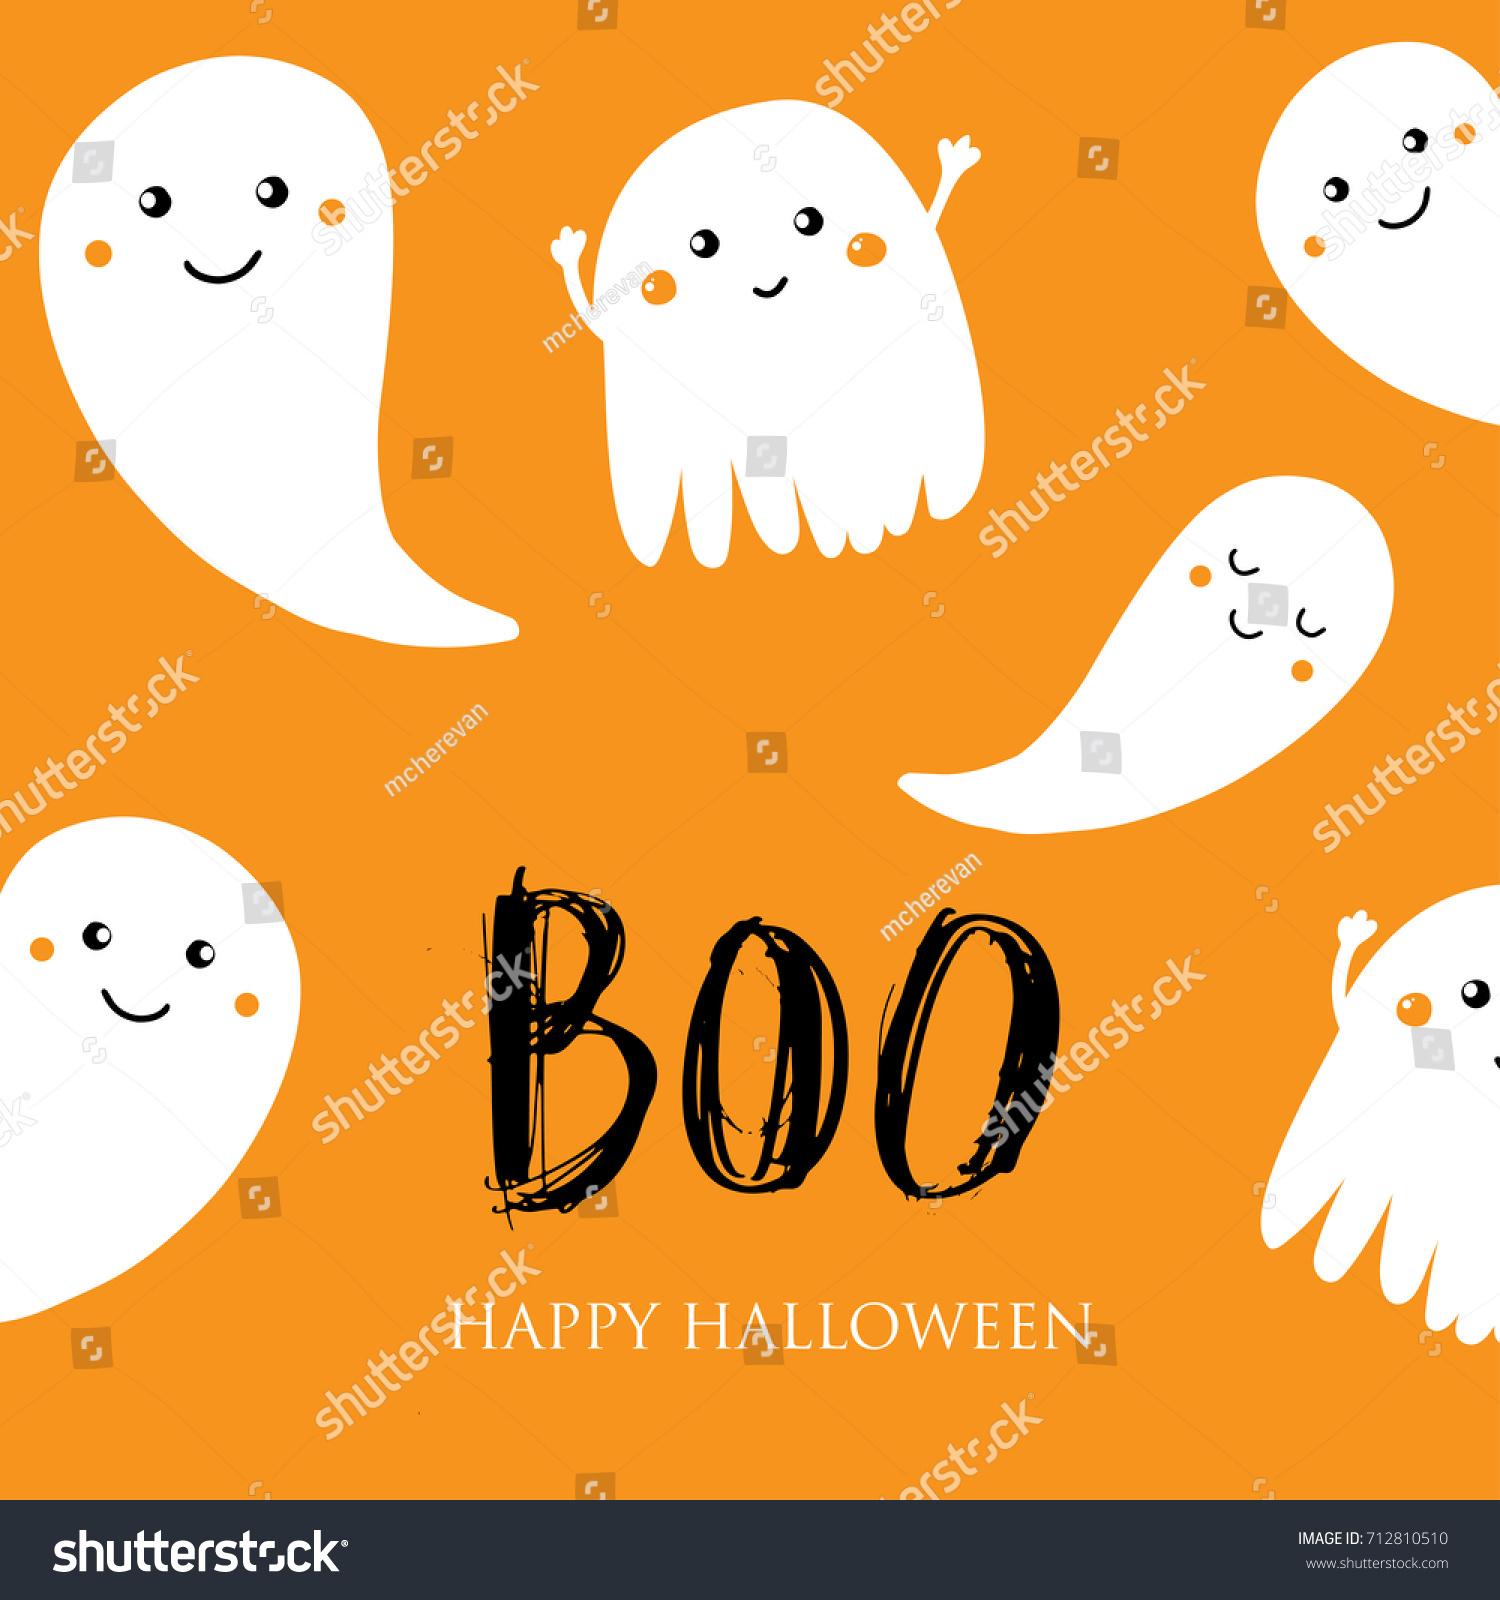 Cute Halloween Invitation Greeting Card Small Stock Vector